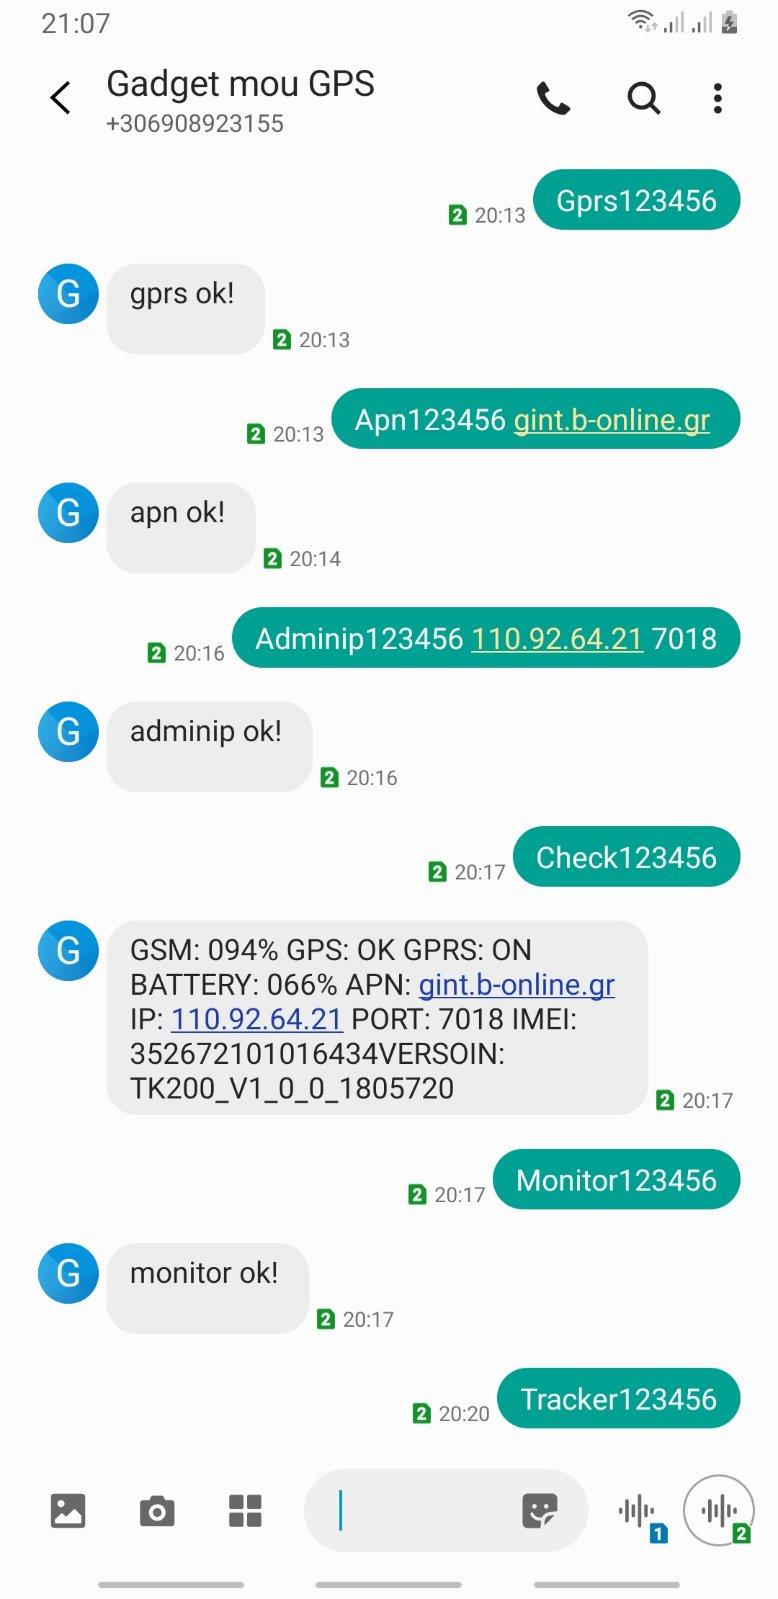 Mini GPS 102B 4 bands GPS GSM GPRS Tracker Device for Vehicle, Car, Motorcycle, Kid, Pet & Elderly, Single Battery OEM Gadget mou